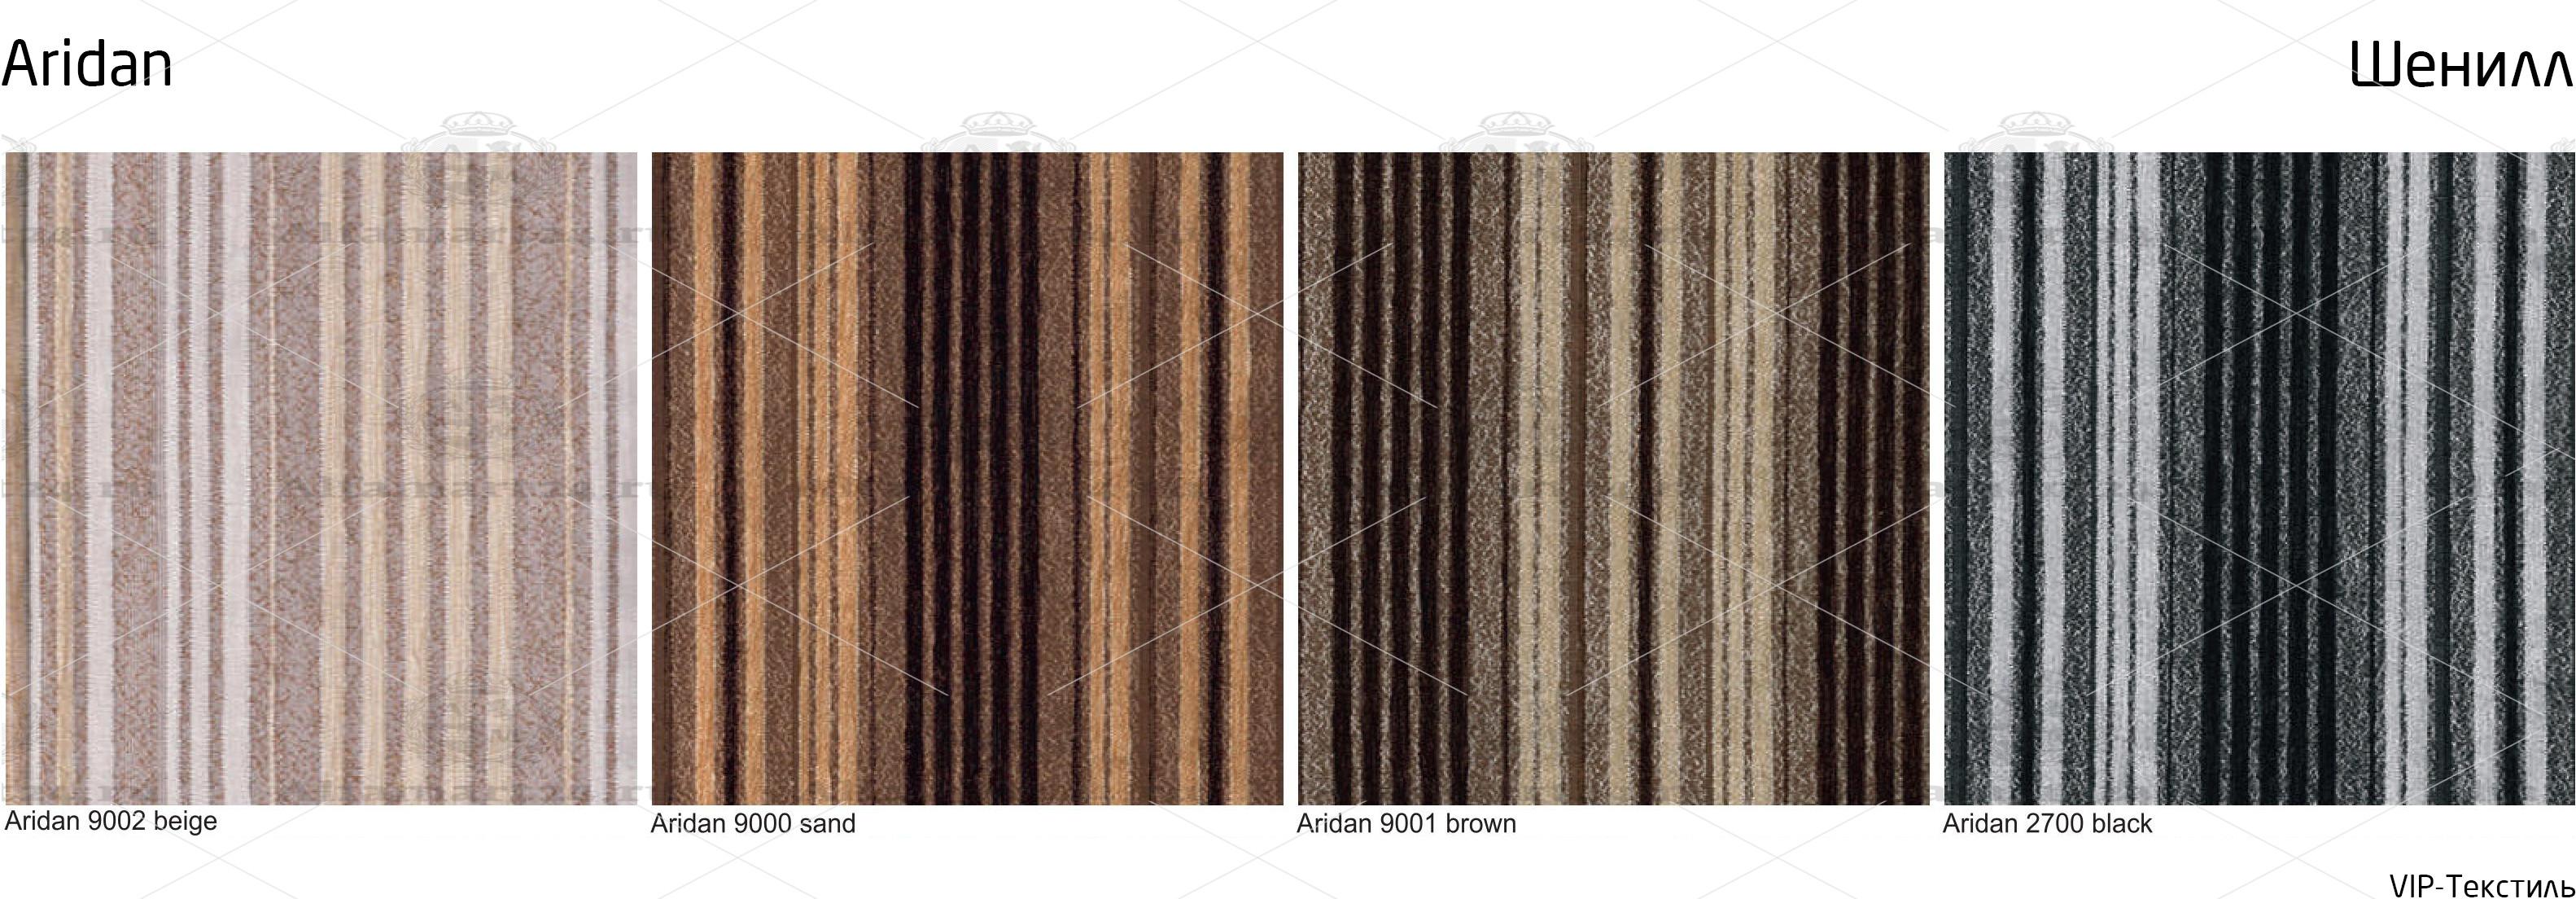 Аридан (шенилл) VIP-текстиль